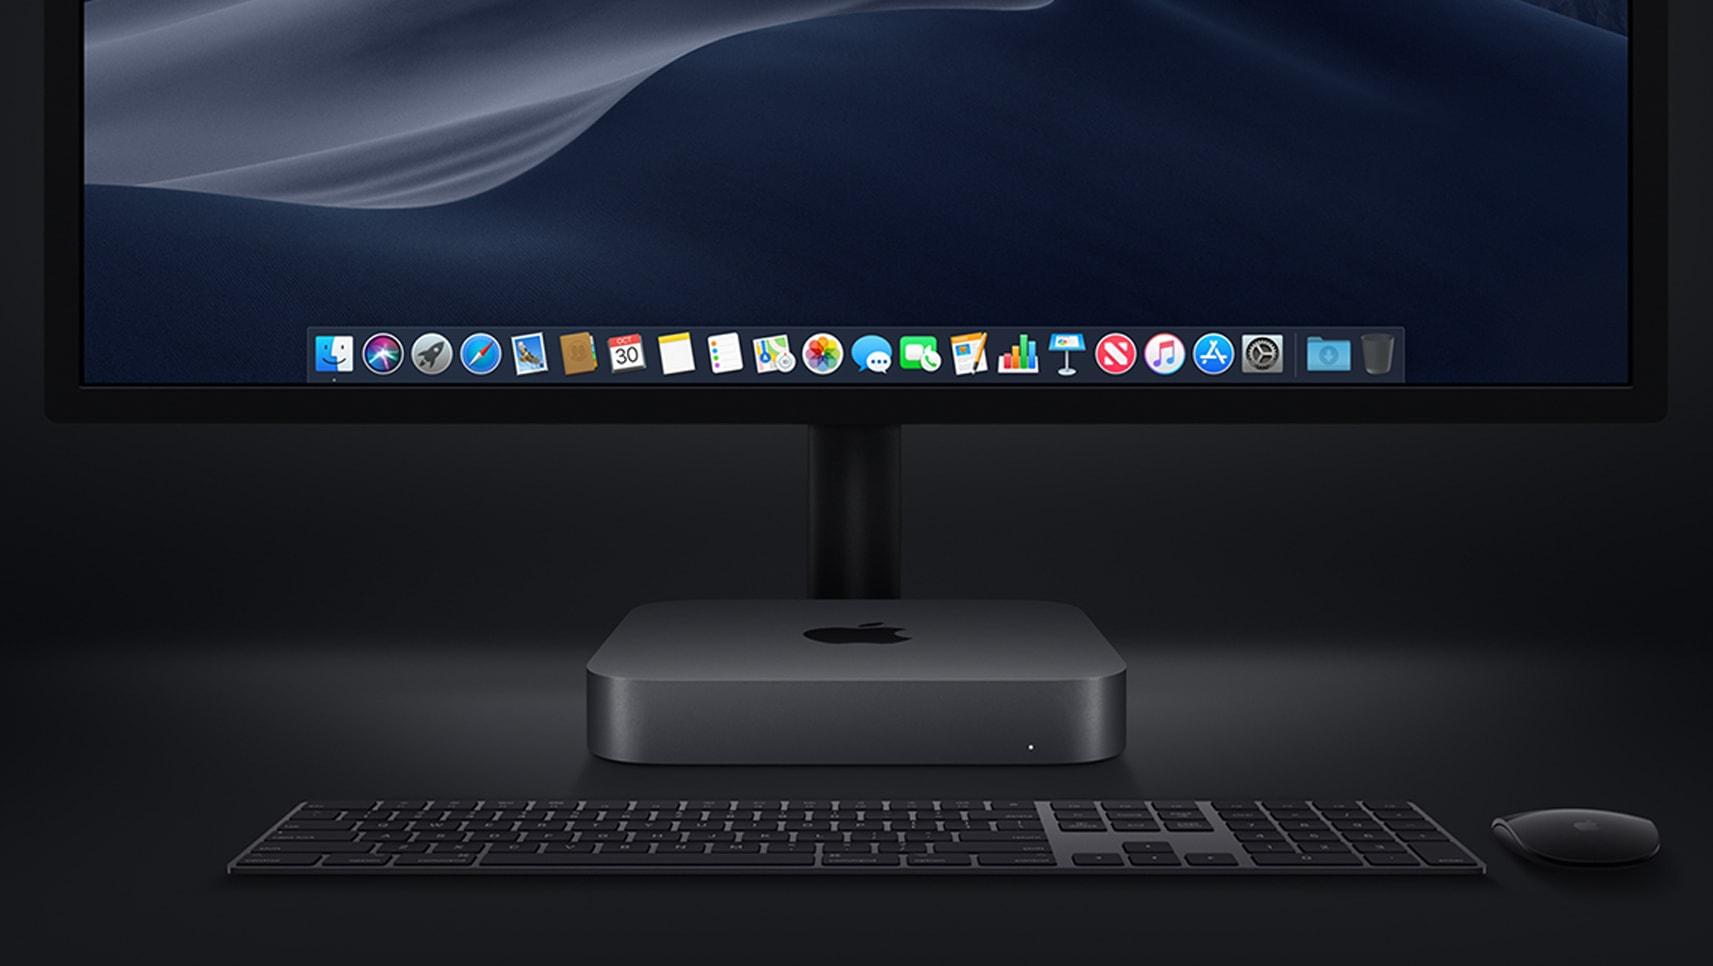 Save $200 on Mac mini, $820 on MacBook Pro [Deals & Steals] | Cult